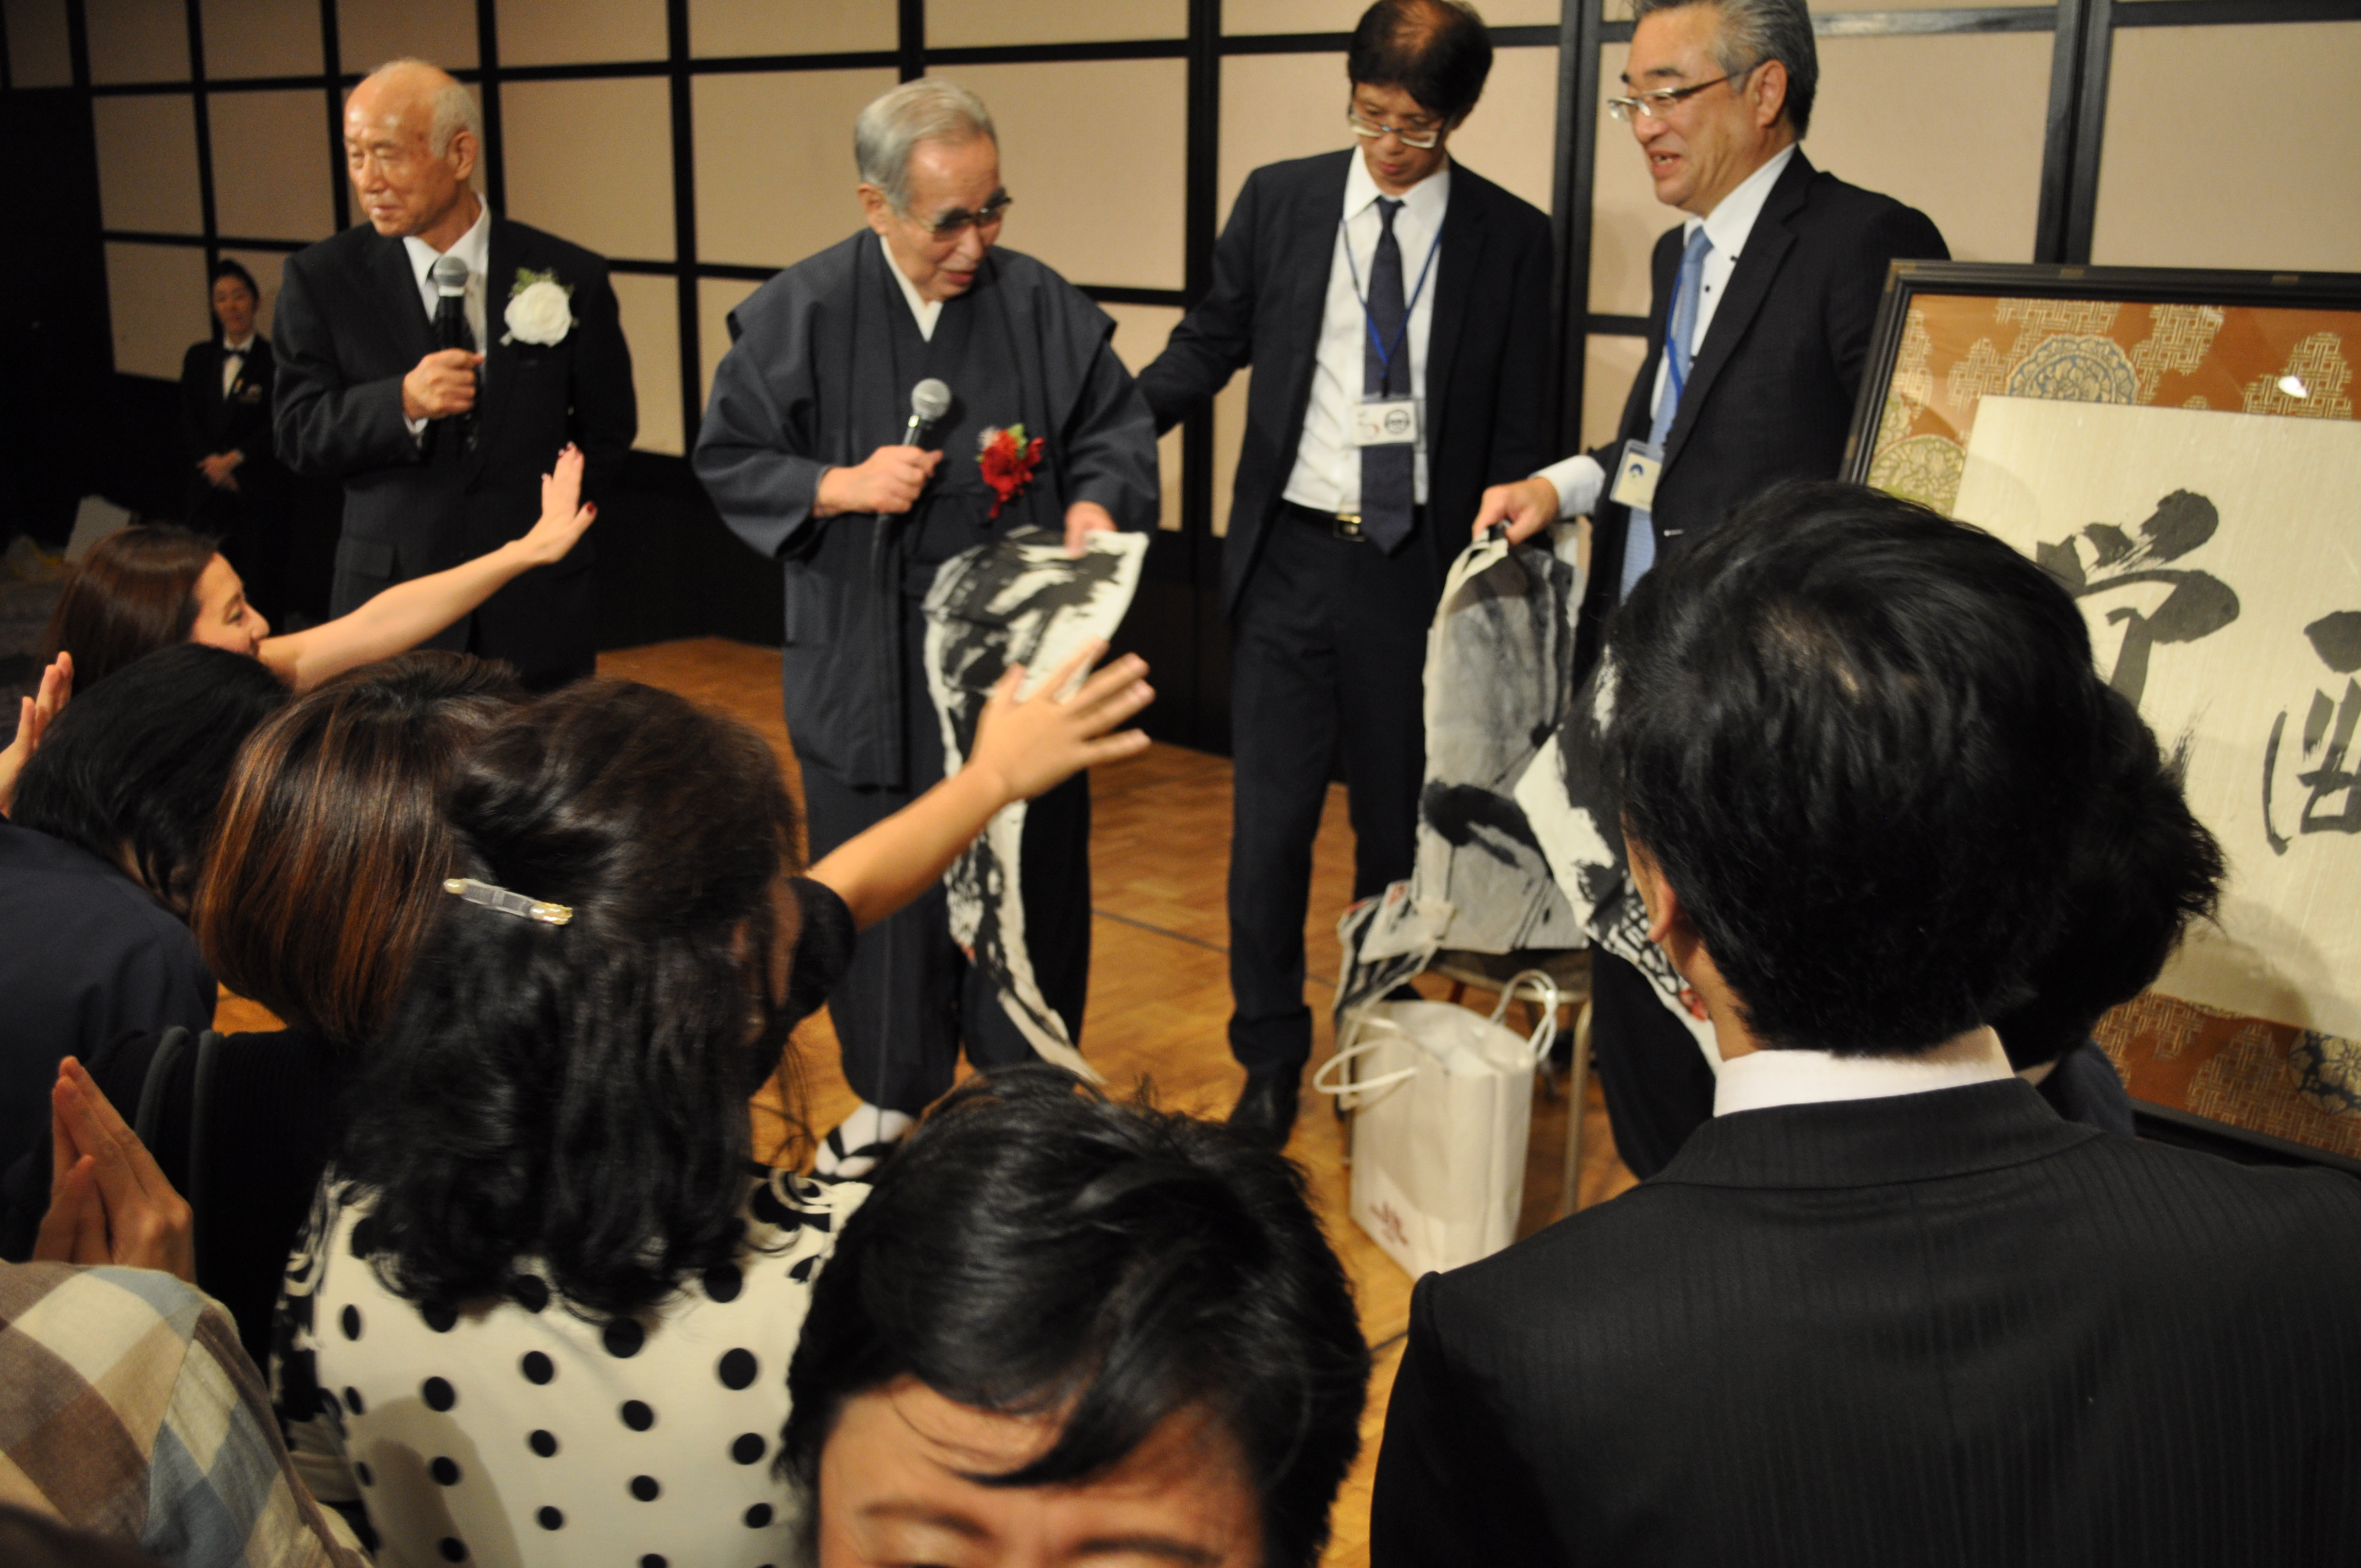 DSC 0571 - 第6回思風会全国大会2018in東京開催